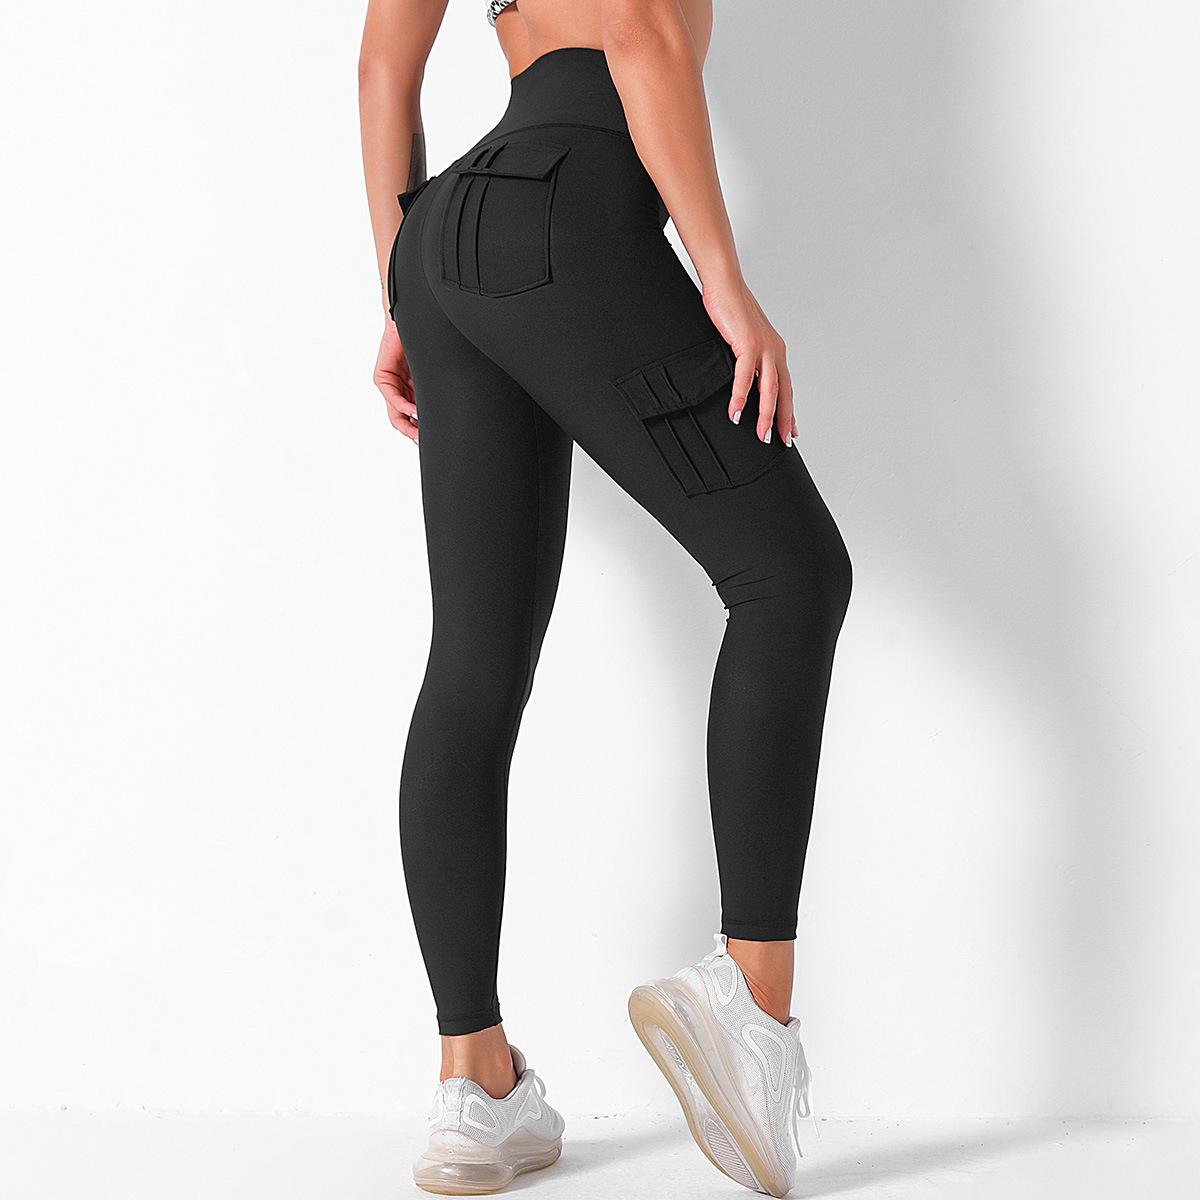 high waist hip stitching color sports yoga pants NSLX9047